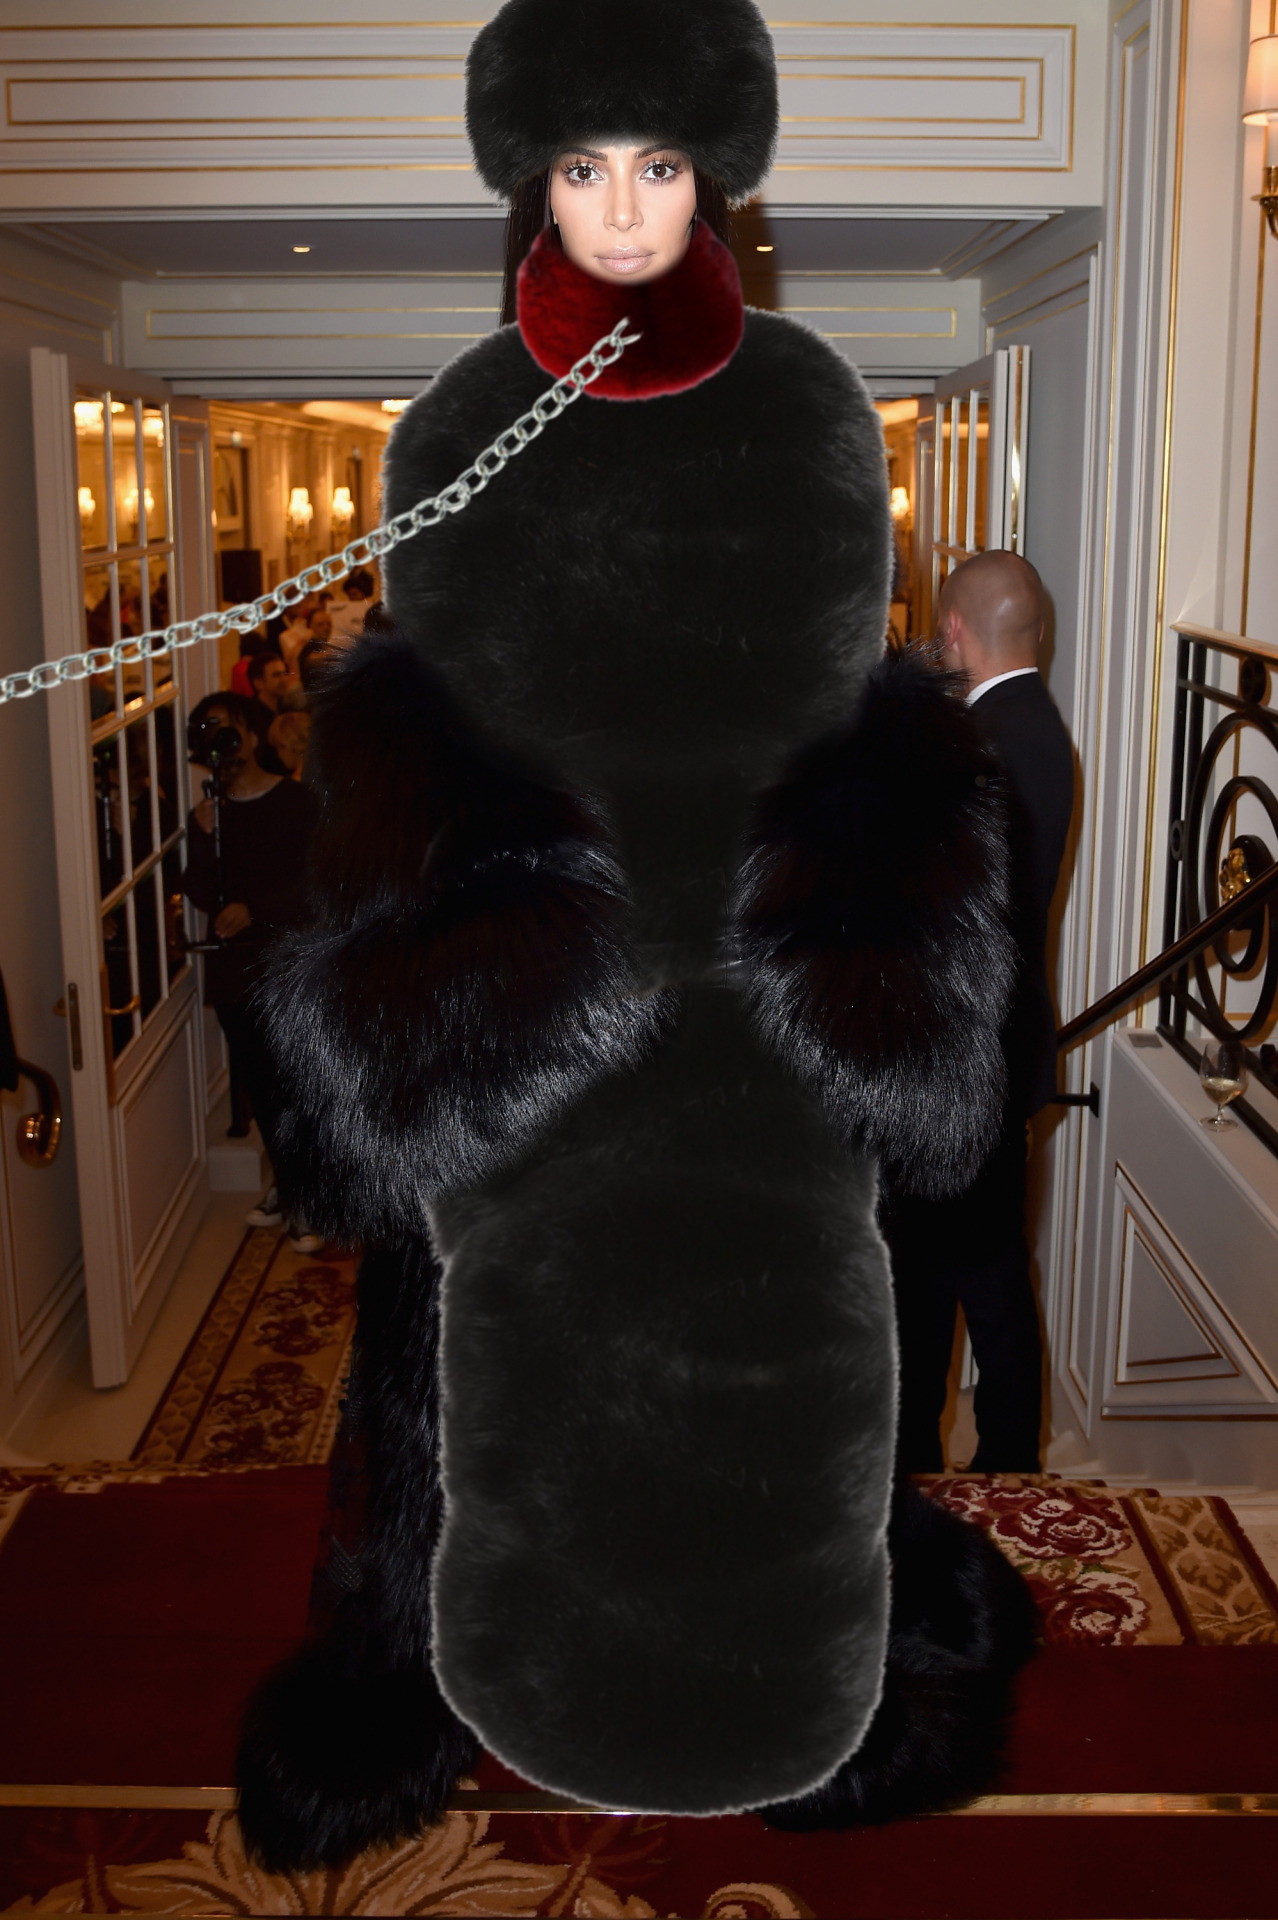 Kim Kardashian fur enslaved by WhiteSnowQueen on DeviantArt